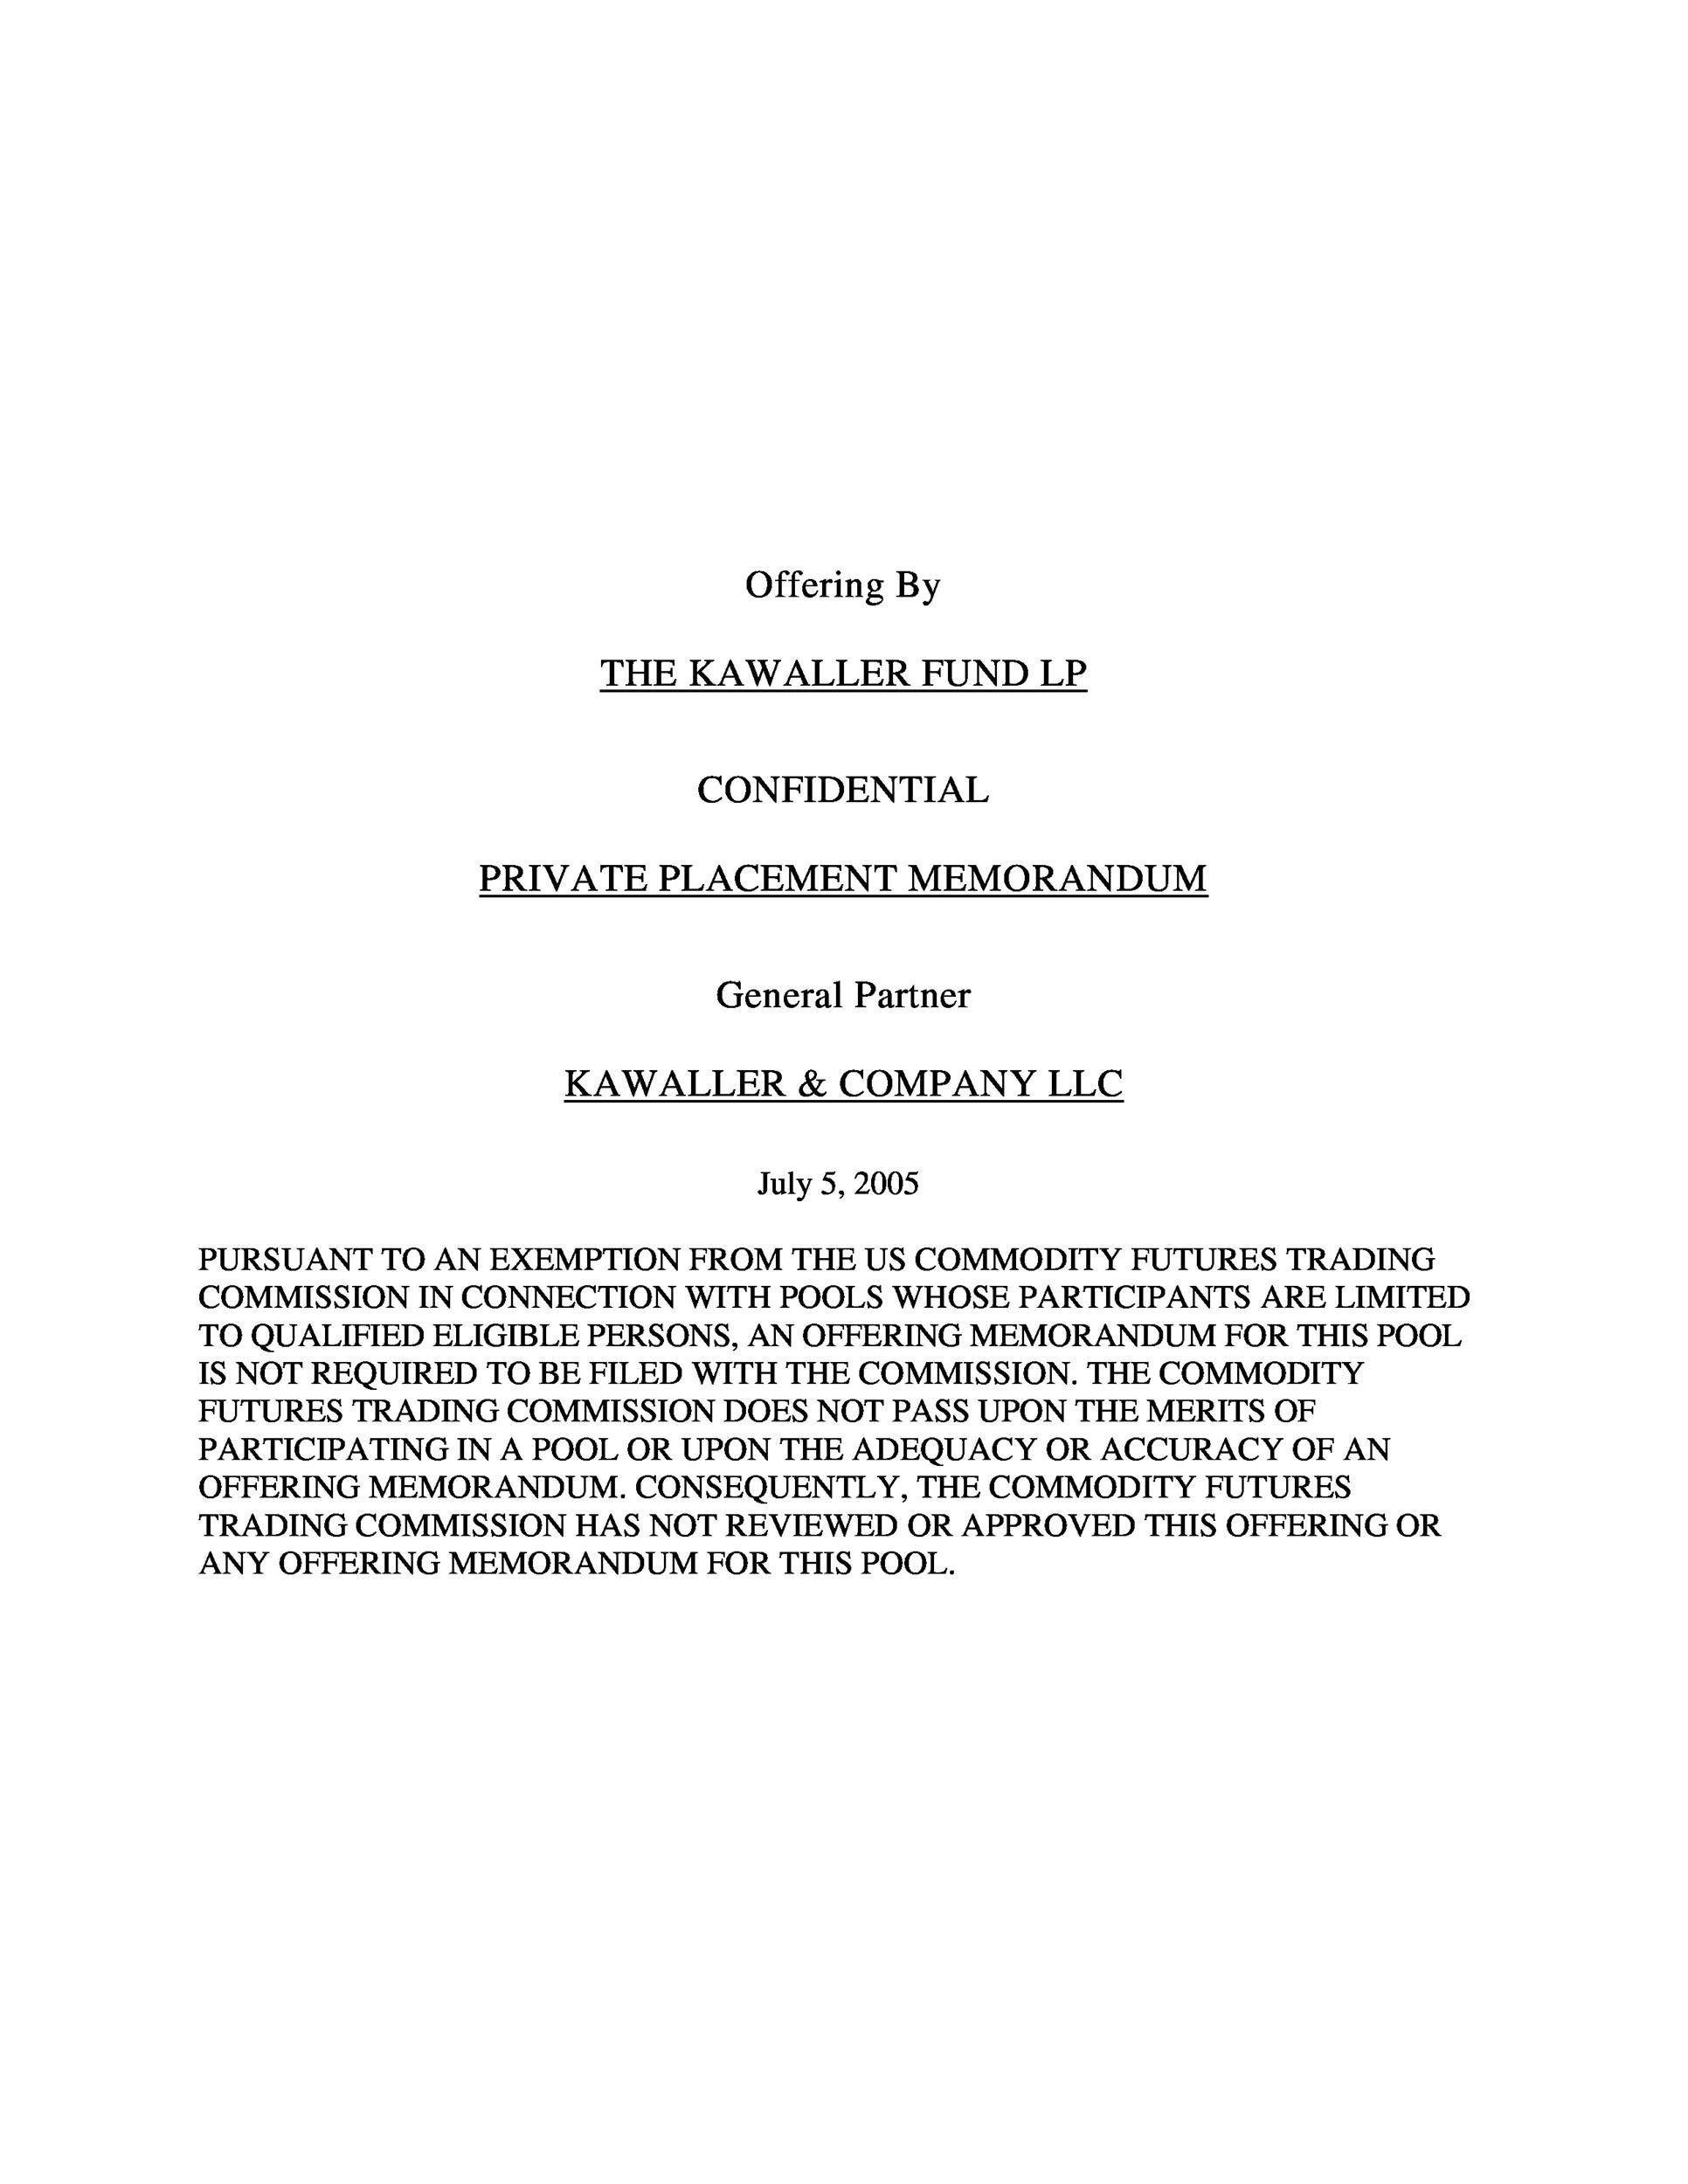 Free private placement memorandum template 35